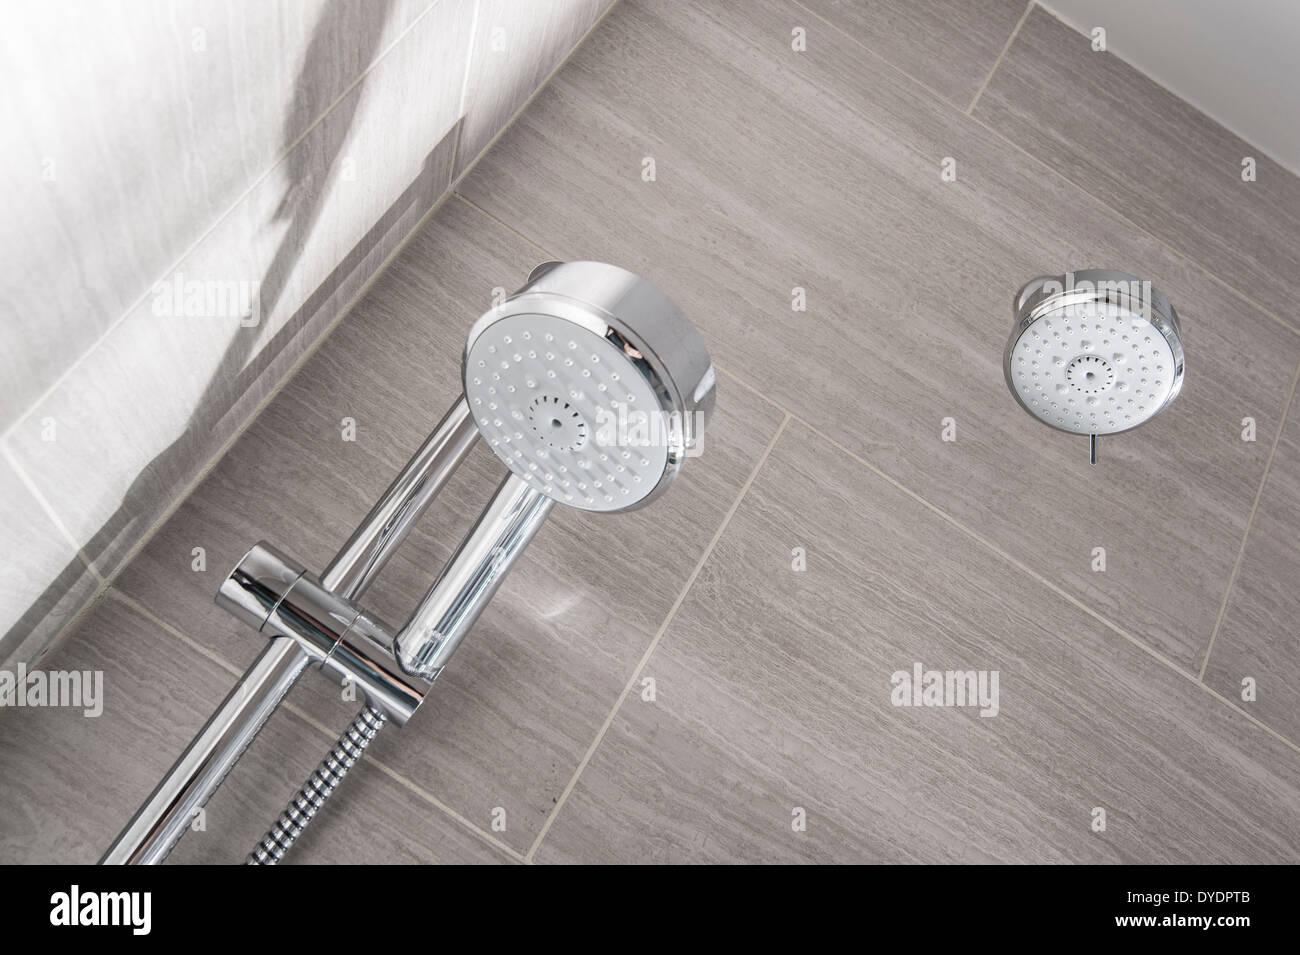 Shower Head Detail - Stock Image